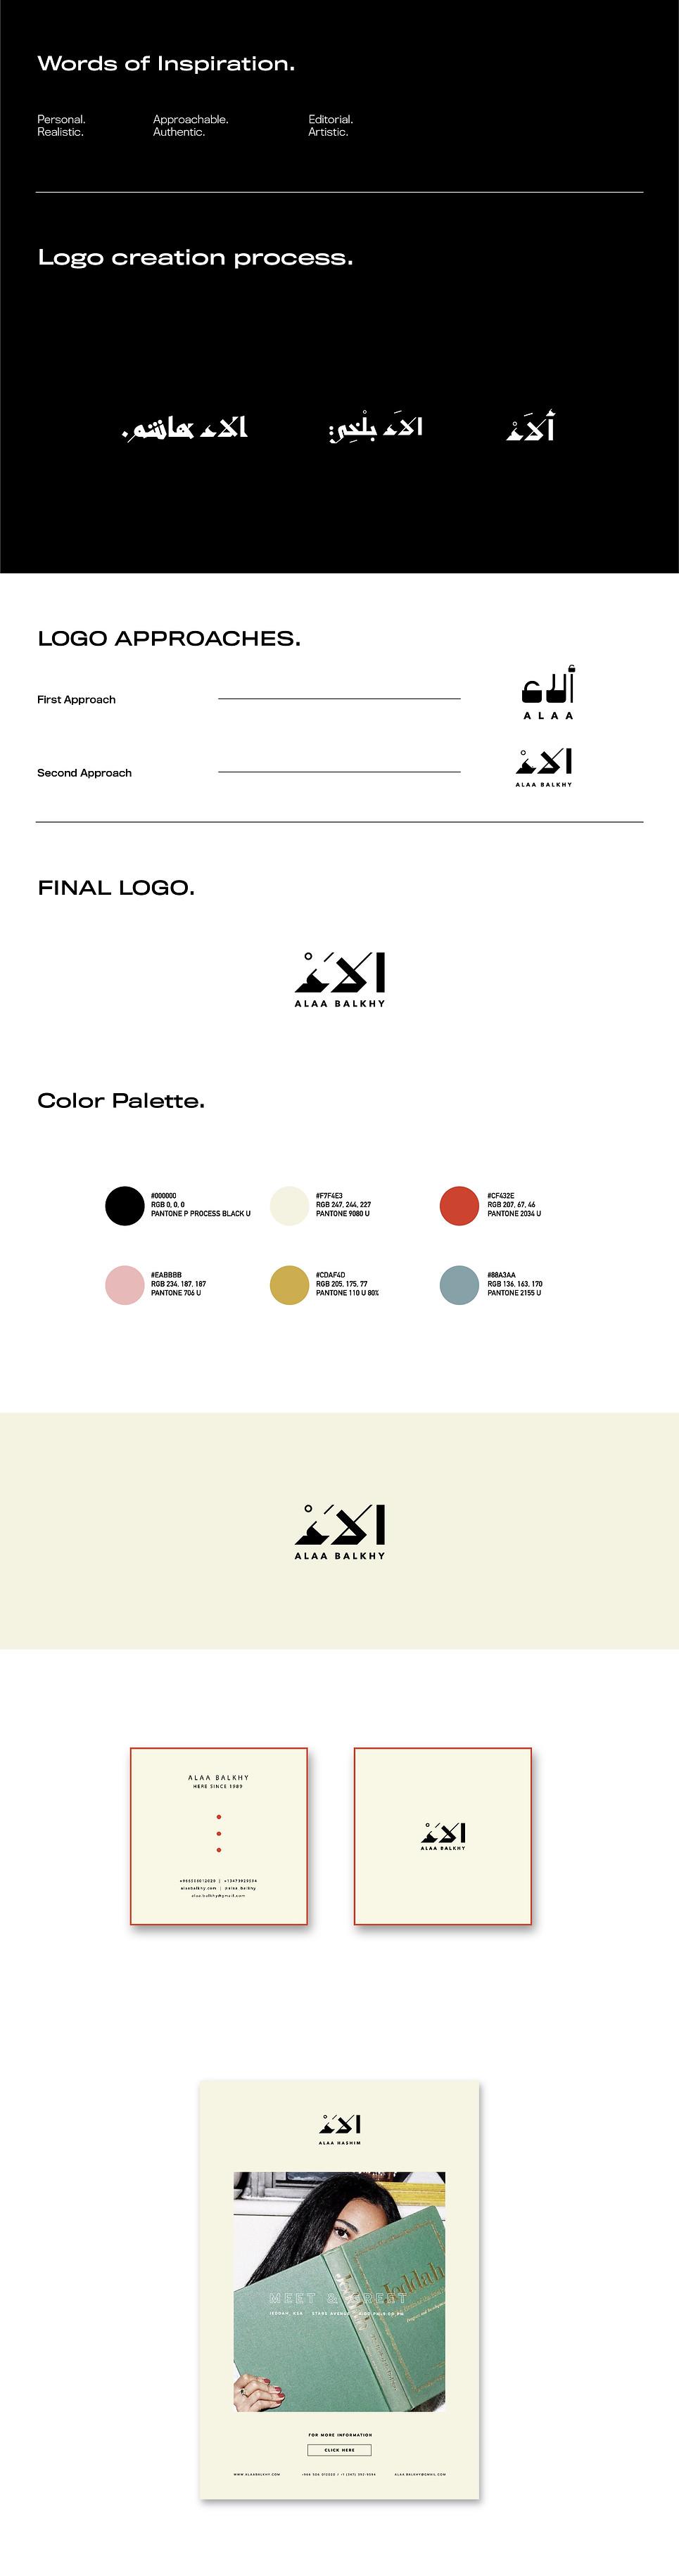 Alaa Balkhy| PROCESS-01.jpg